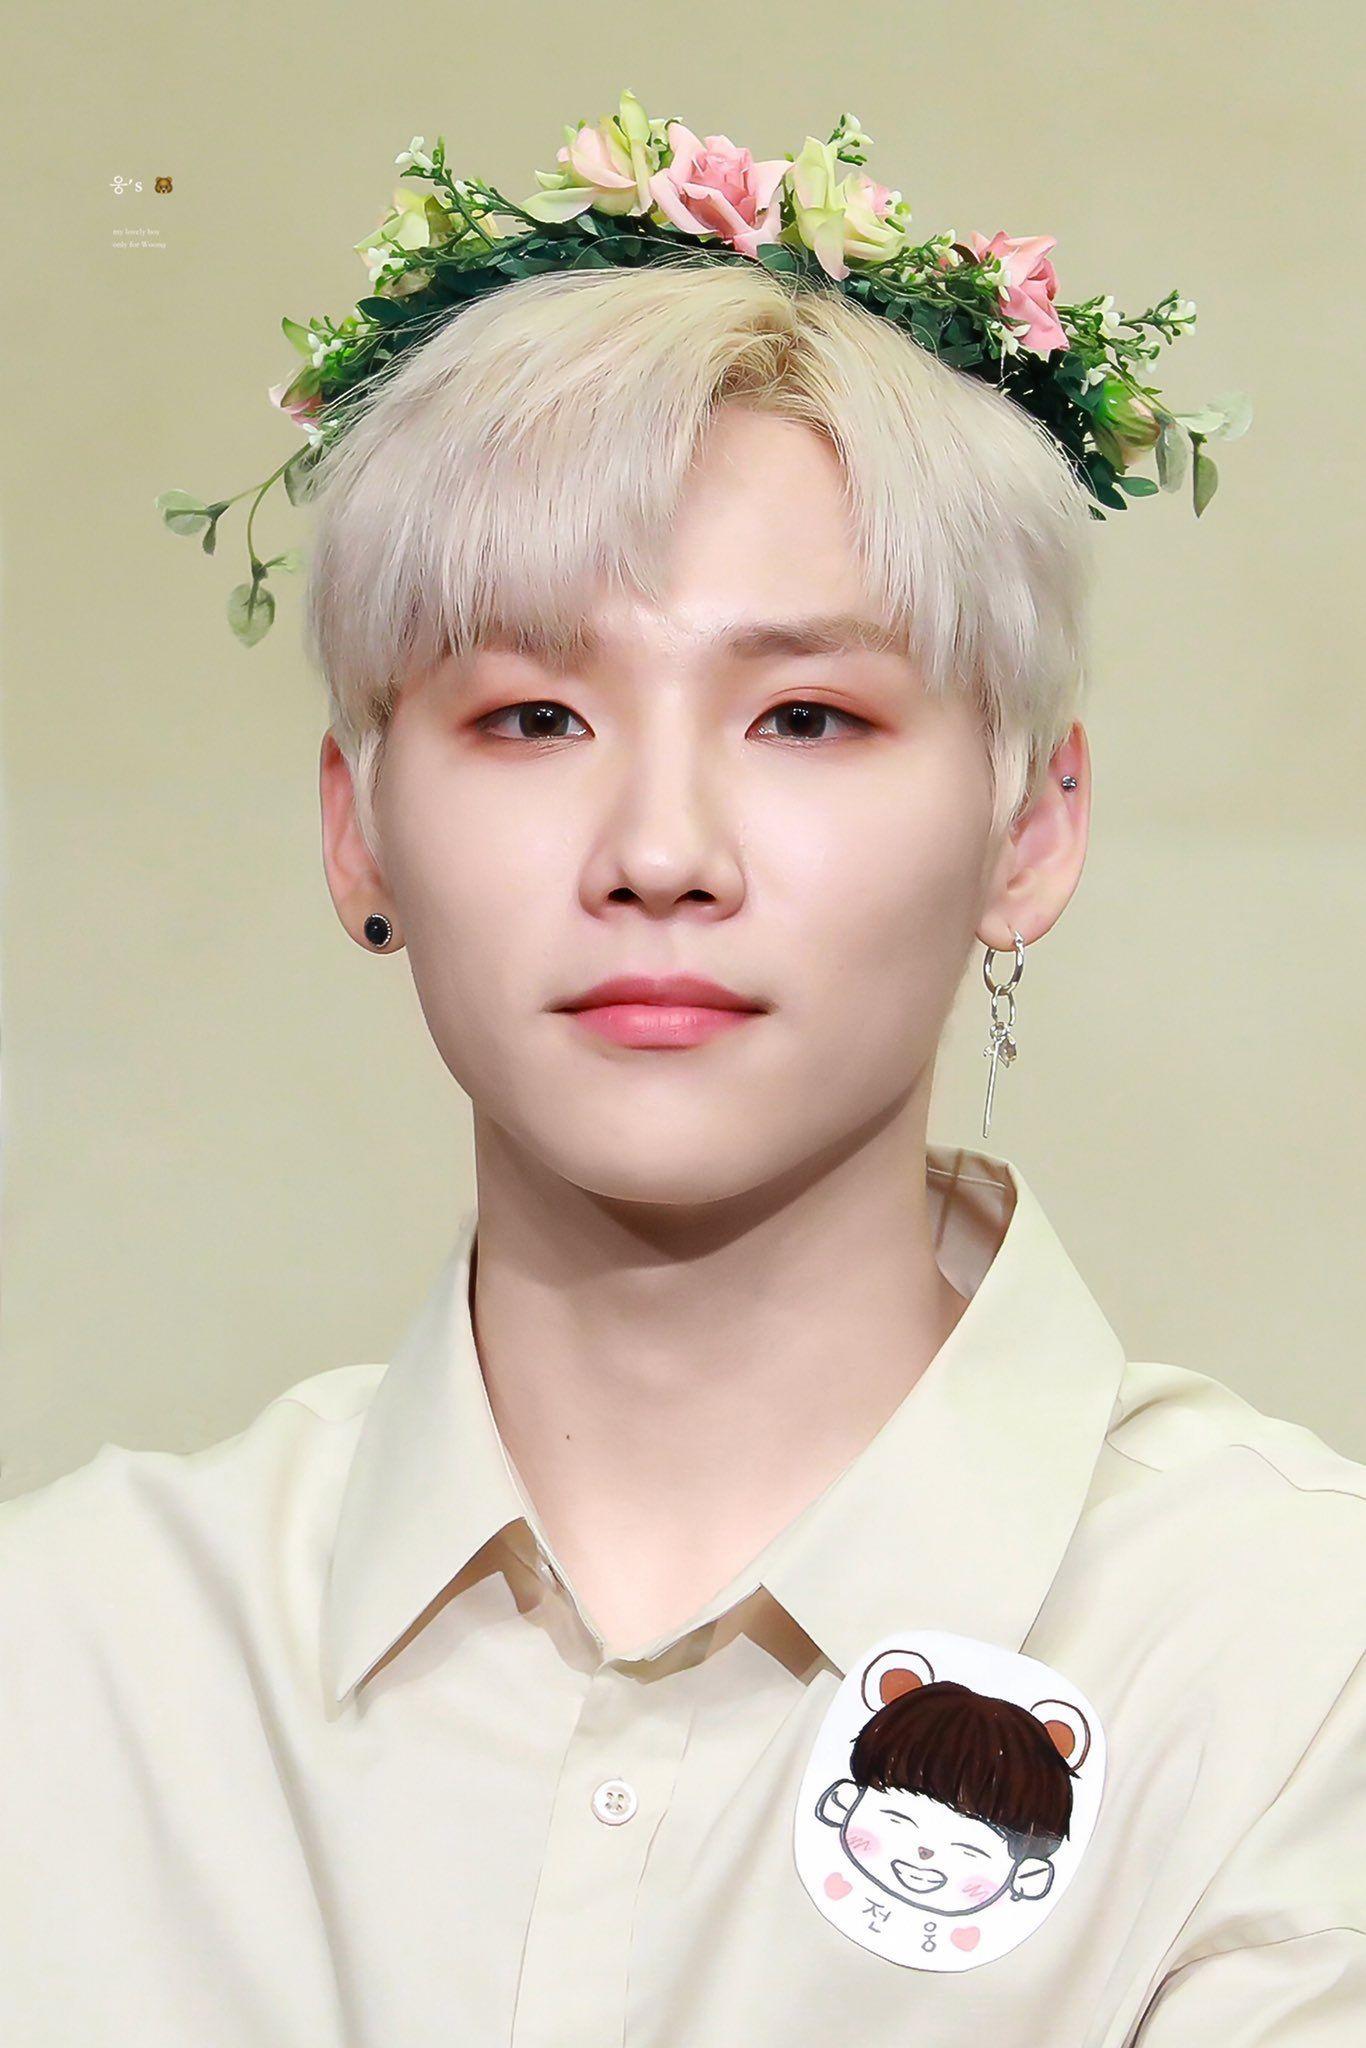 Ab6ix 전웅 에이비식스 Jeonwoong Woong Jeon Korean Music Boy Groups